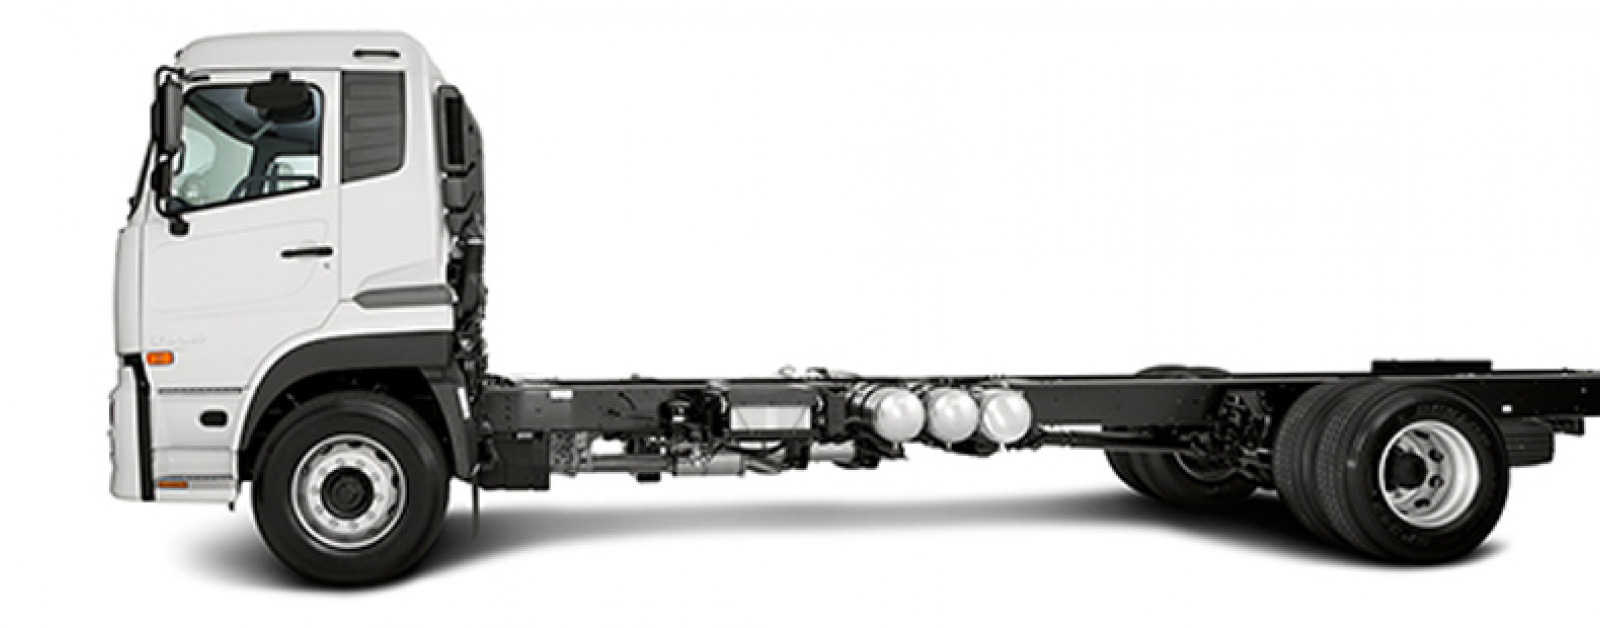 Quon CK 380 Series